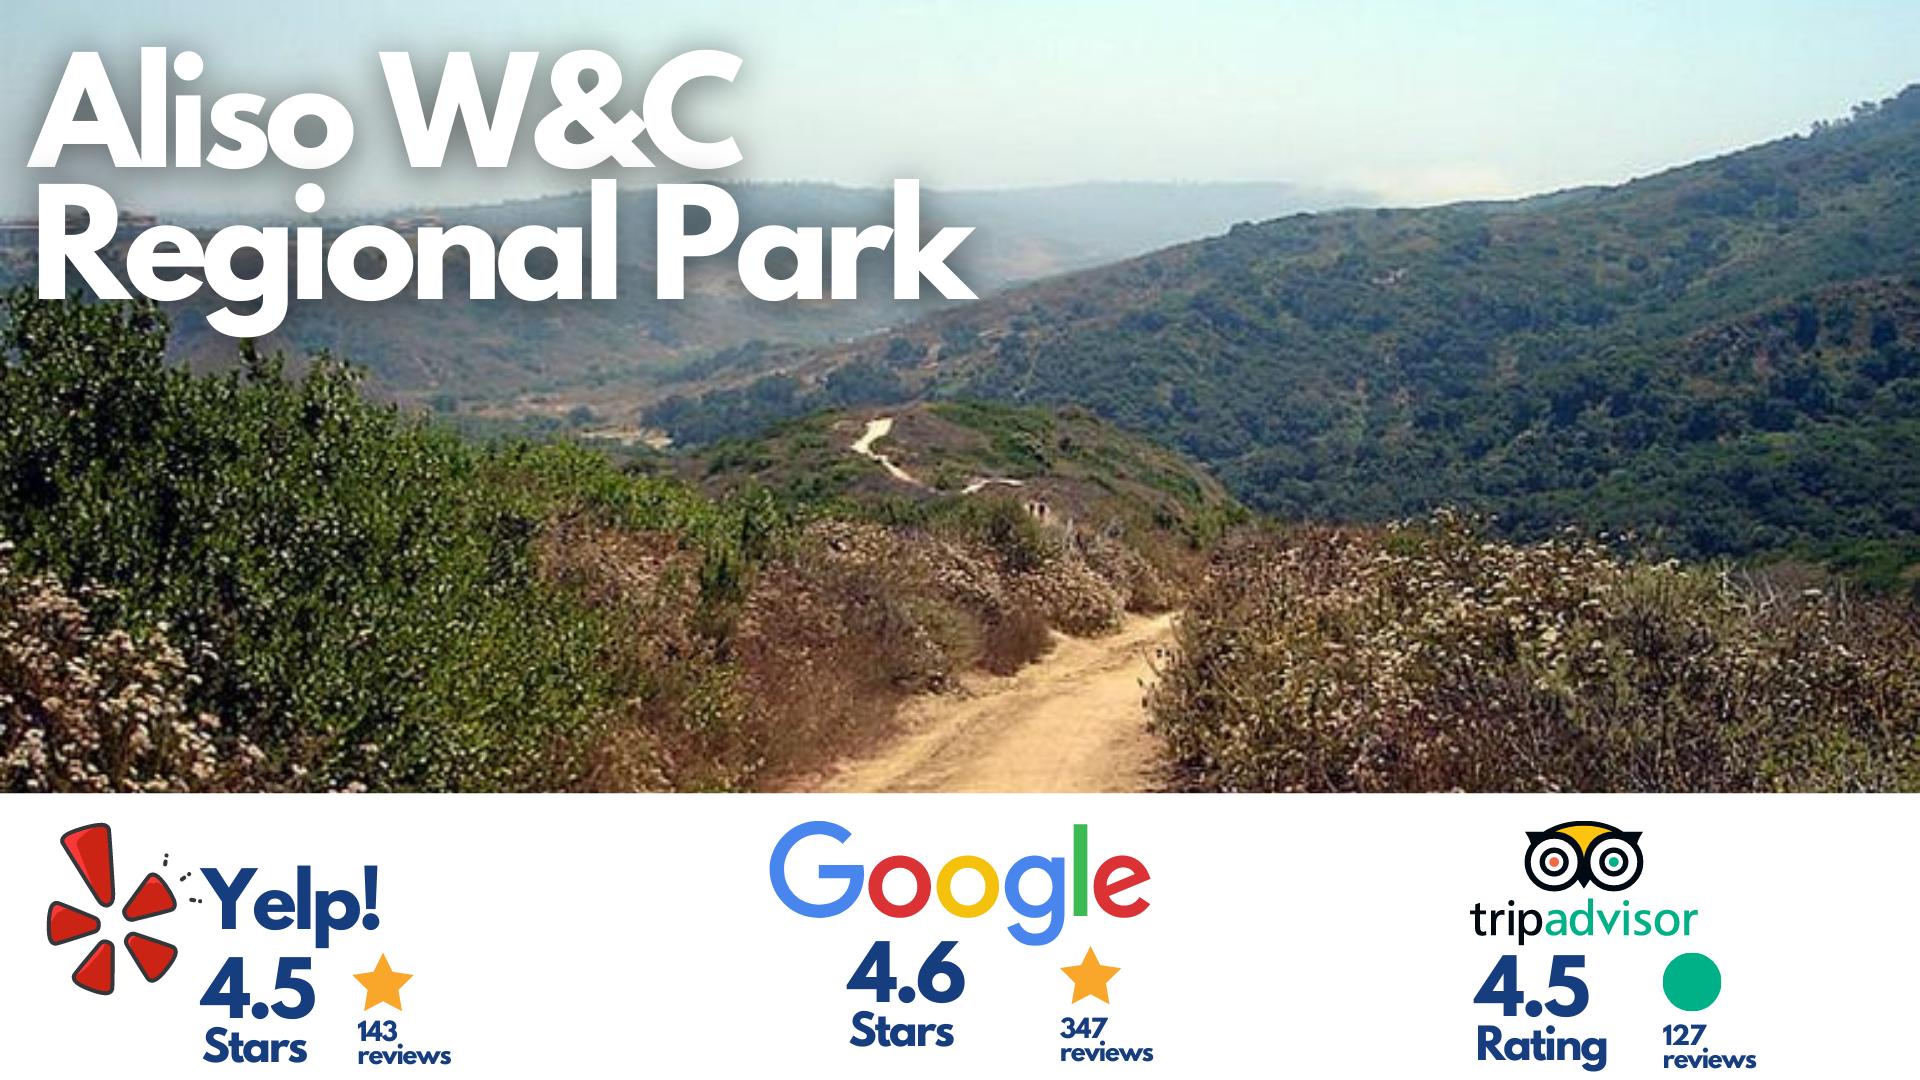 Aliso Woods and Canyon Regional Park, Dana Point, California